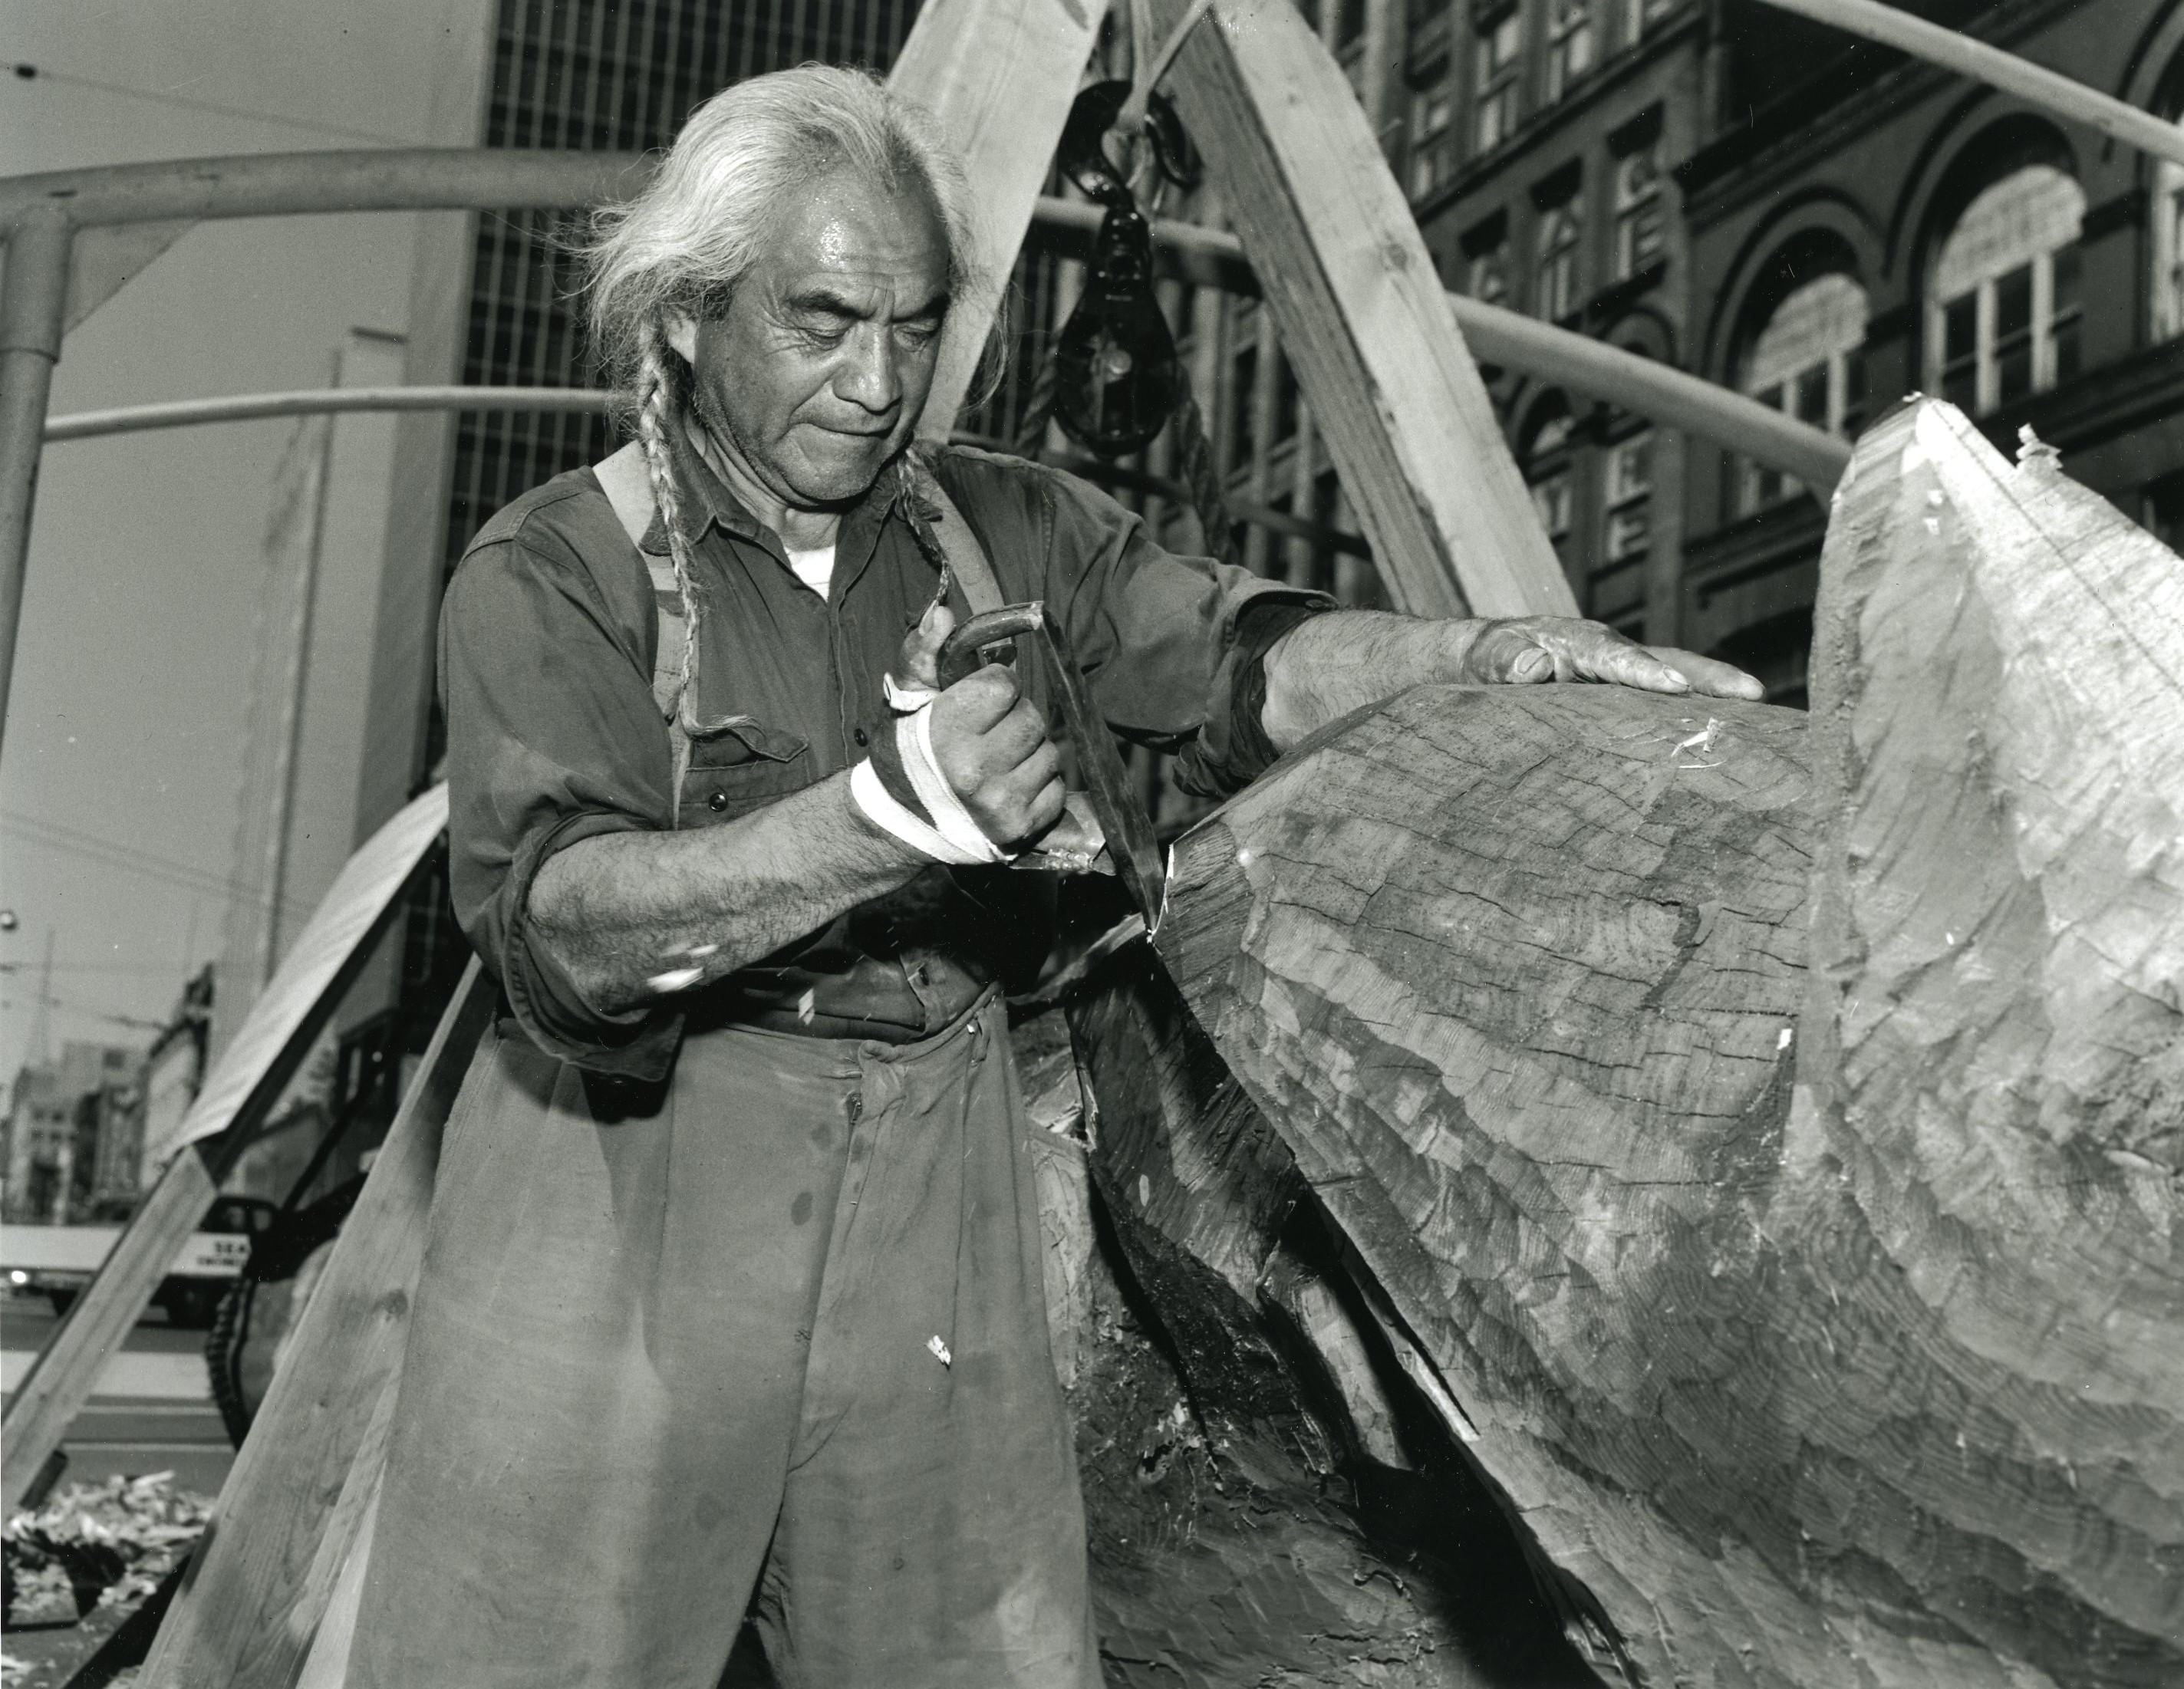 Joseph Hillaire: Carver of the Kobe-Seattle Sister City Friendship Pole